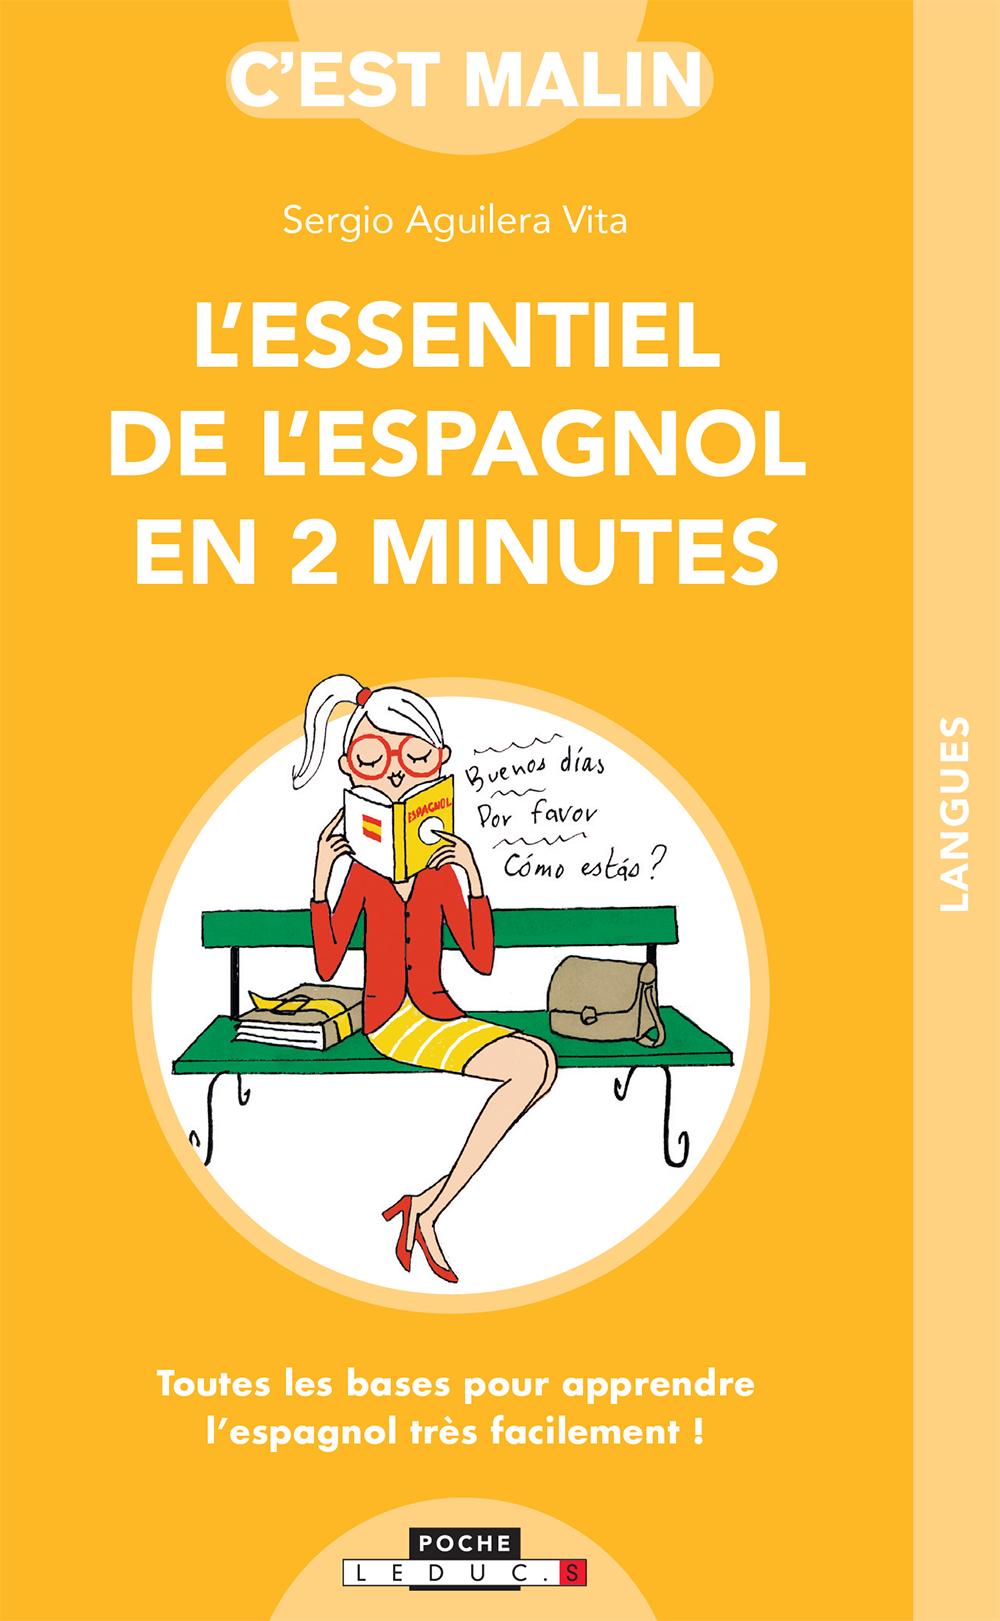 L'essentiel de l'espagnol en 2 minutes Toutes les bases